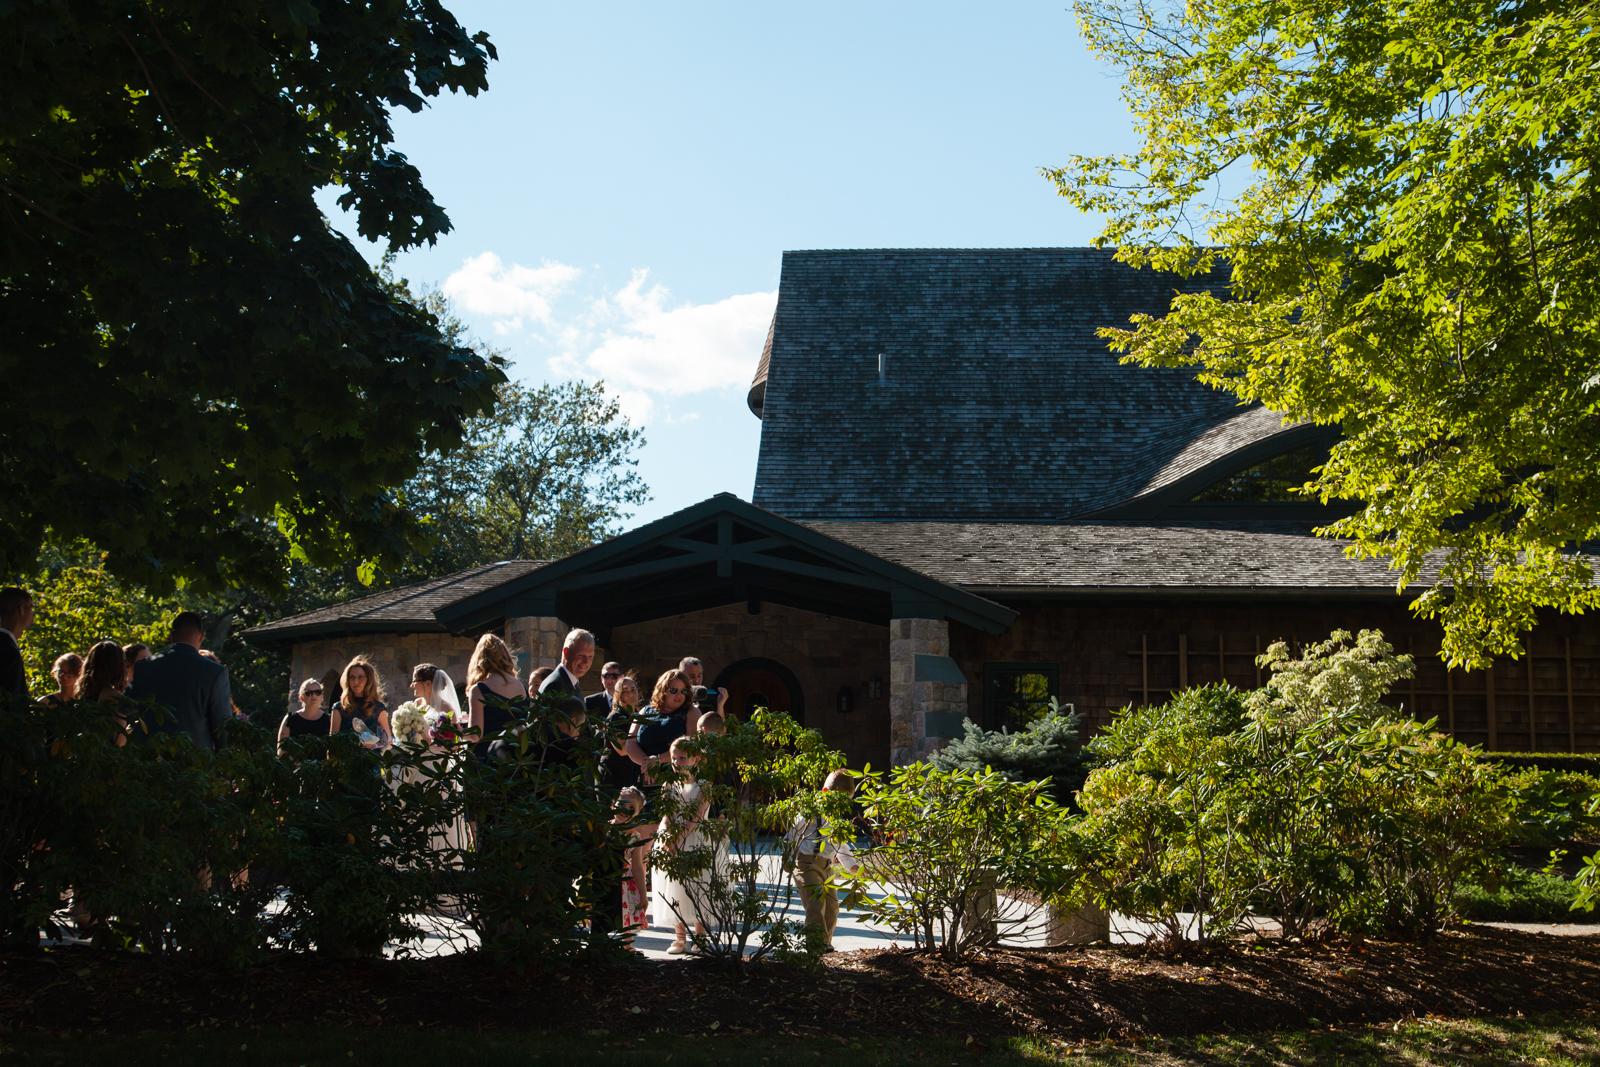 Eastons-Beach-Rotunda-Ballroom-Wedding-Newport-Rhode-Island-PhotographybyAmandaMorgan-51.jpg